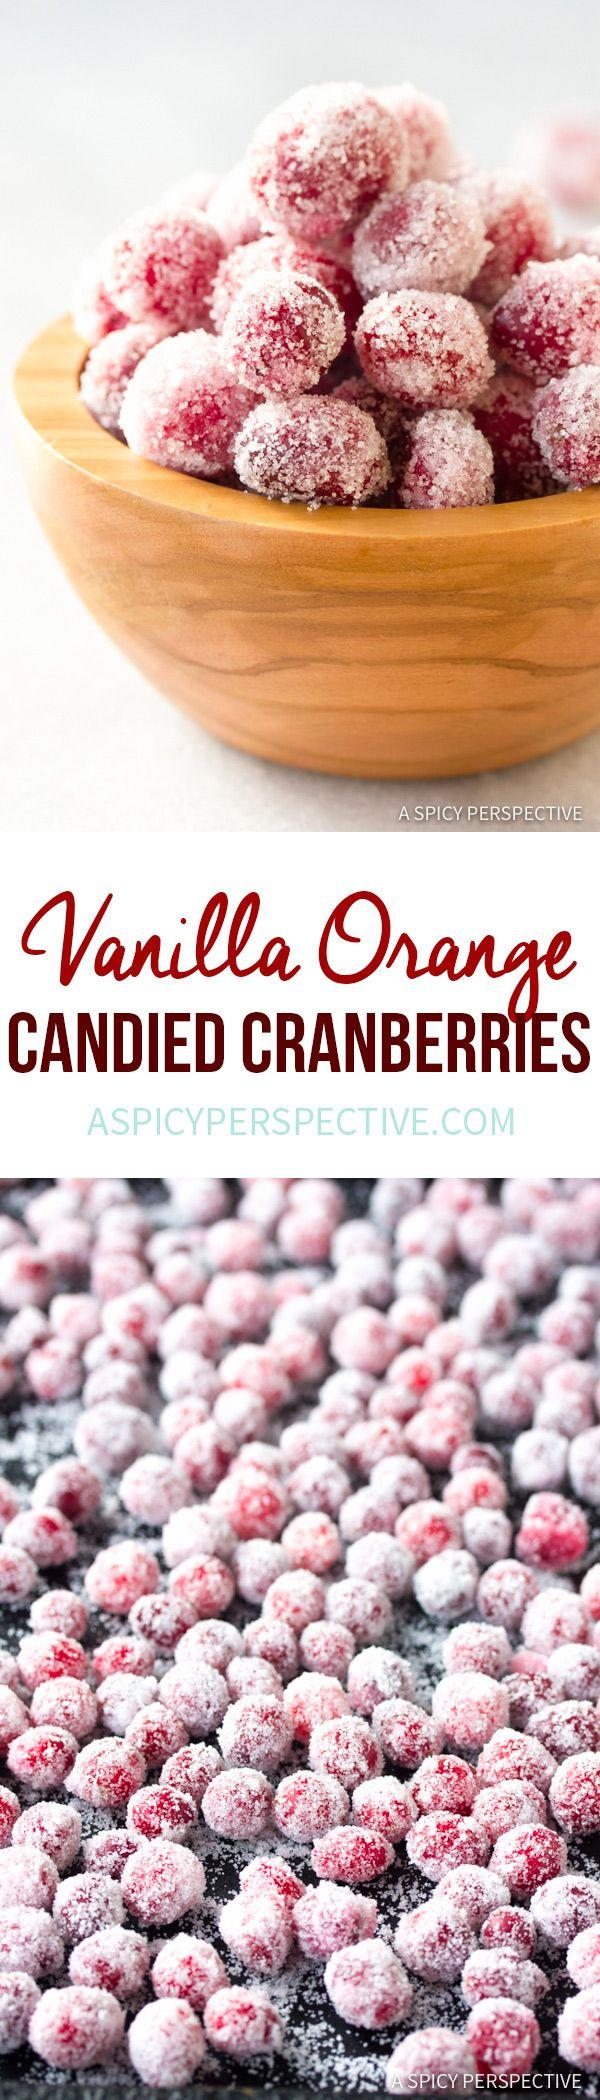 Holiday Vanilla Orange Candied Cranberries Recipe | ASpicyPerspective.com #thanksgiving #christmas via @spicyperspectiv